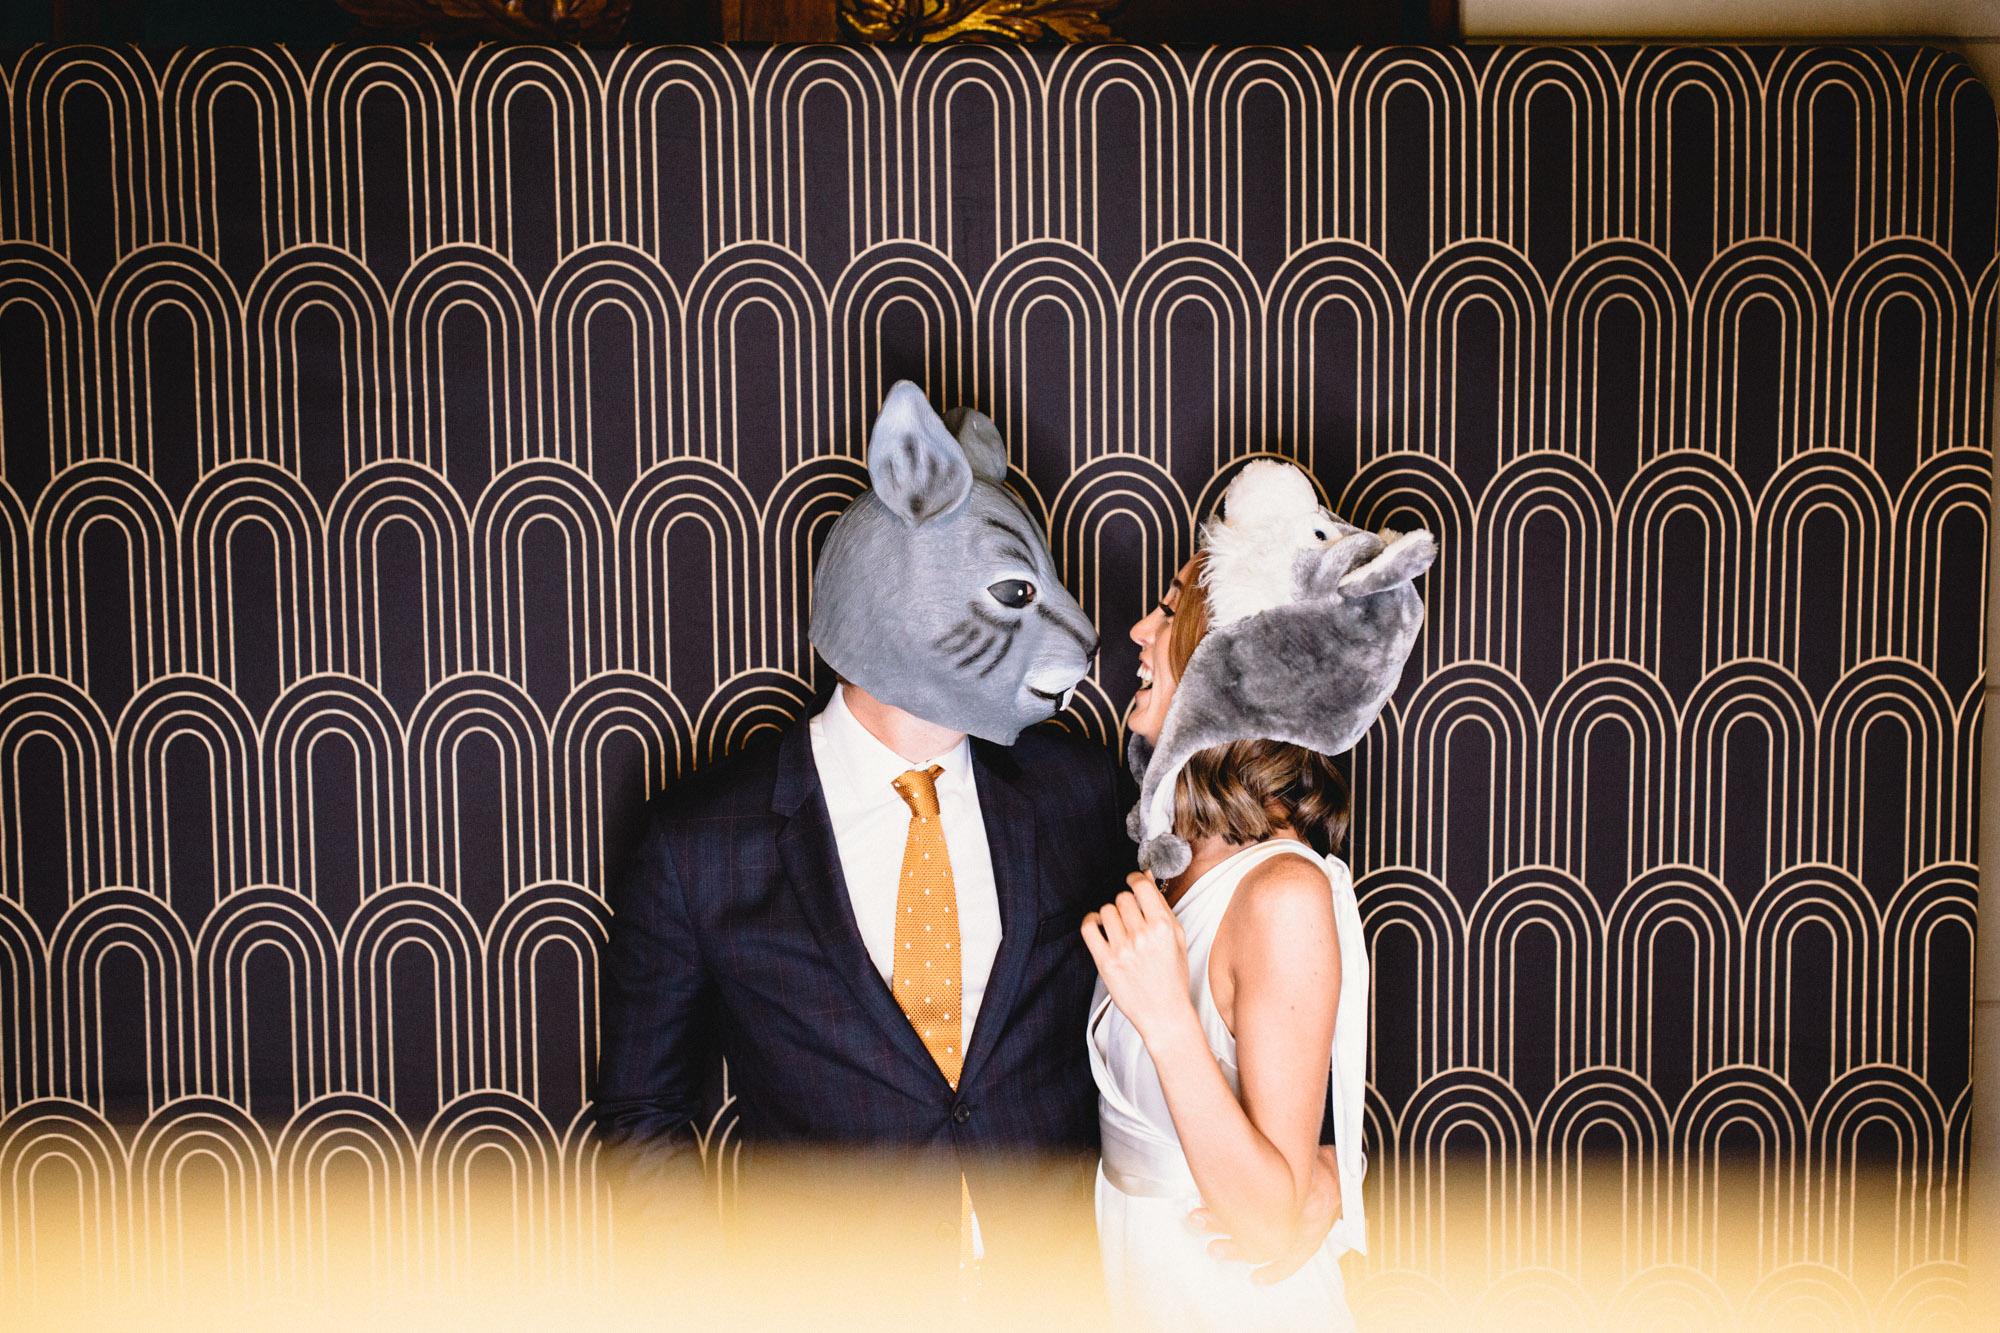 Campbell Point House Wedding HJ + Dean Raphael Weddings-146.jpg